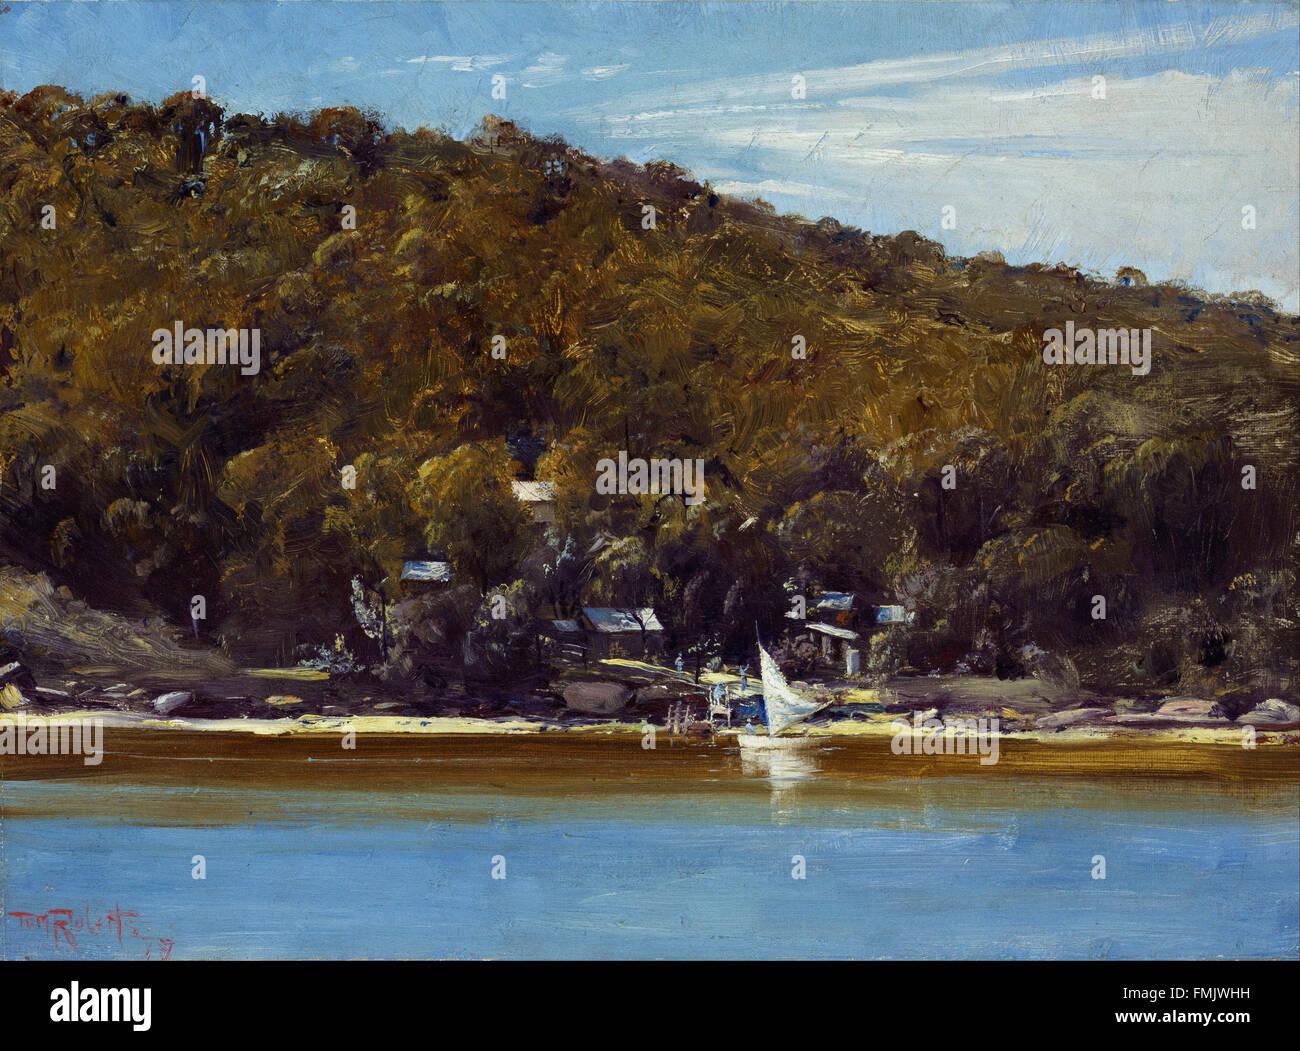 Tom Roberts - The camp, Sirius Cove - Stock Image